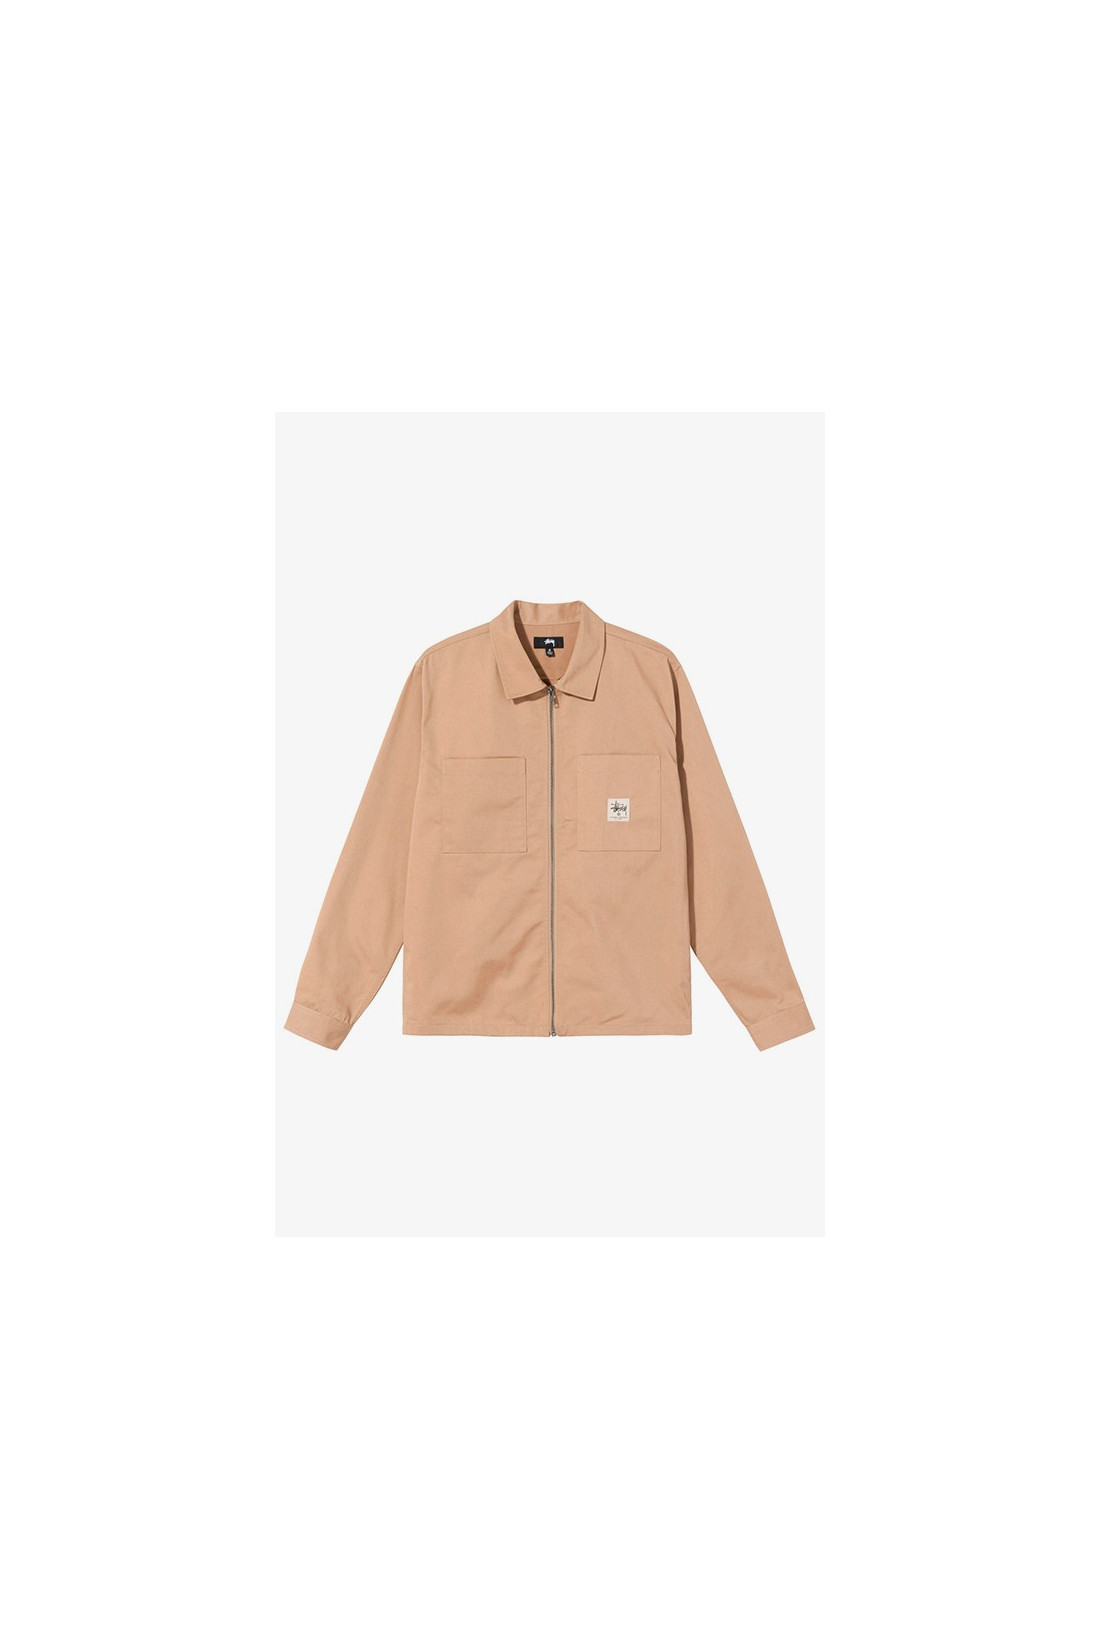 STUSSY / Zip up work ls shirt Camel